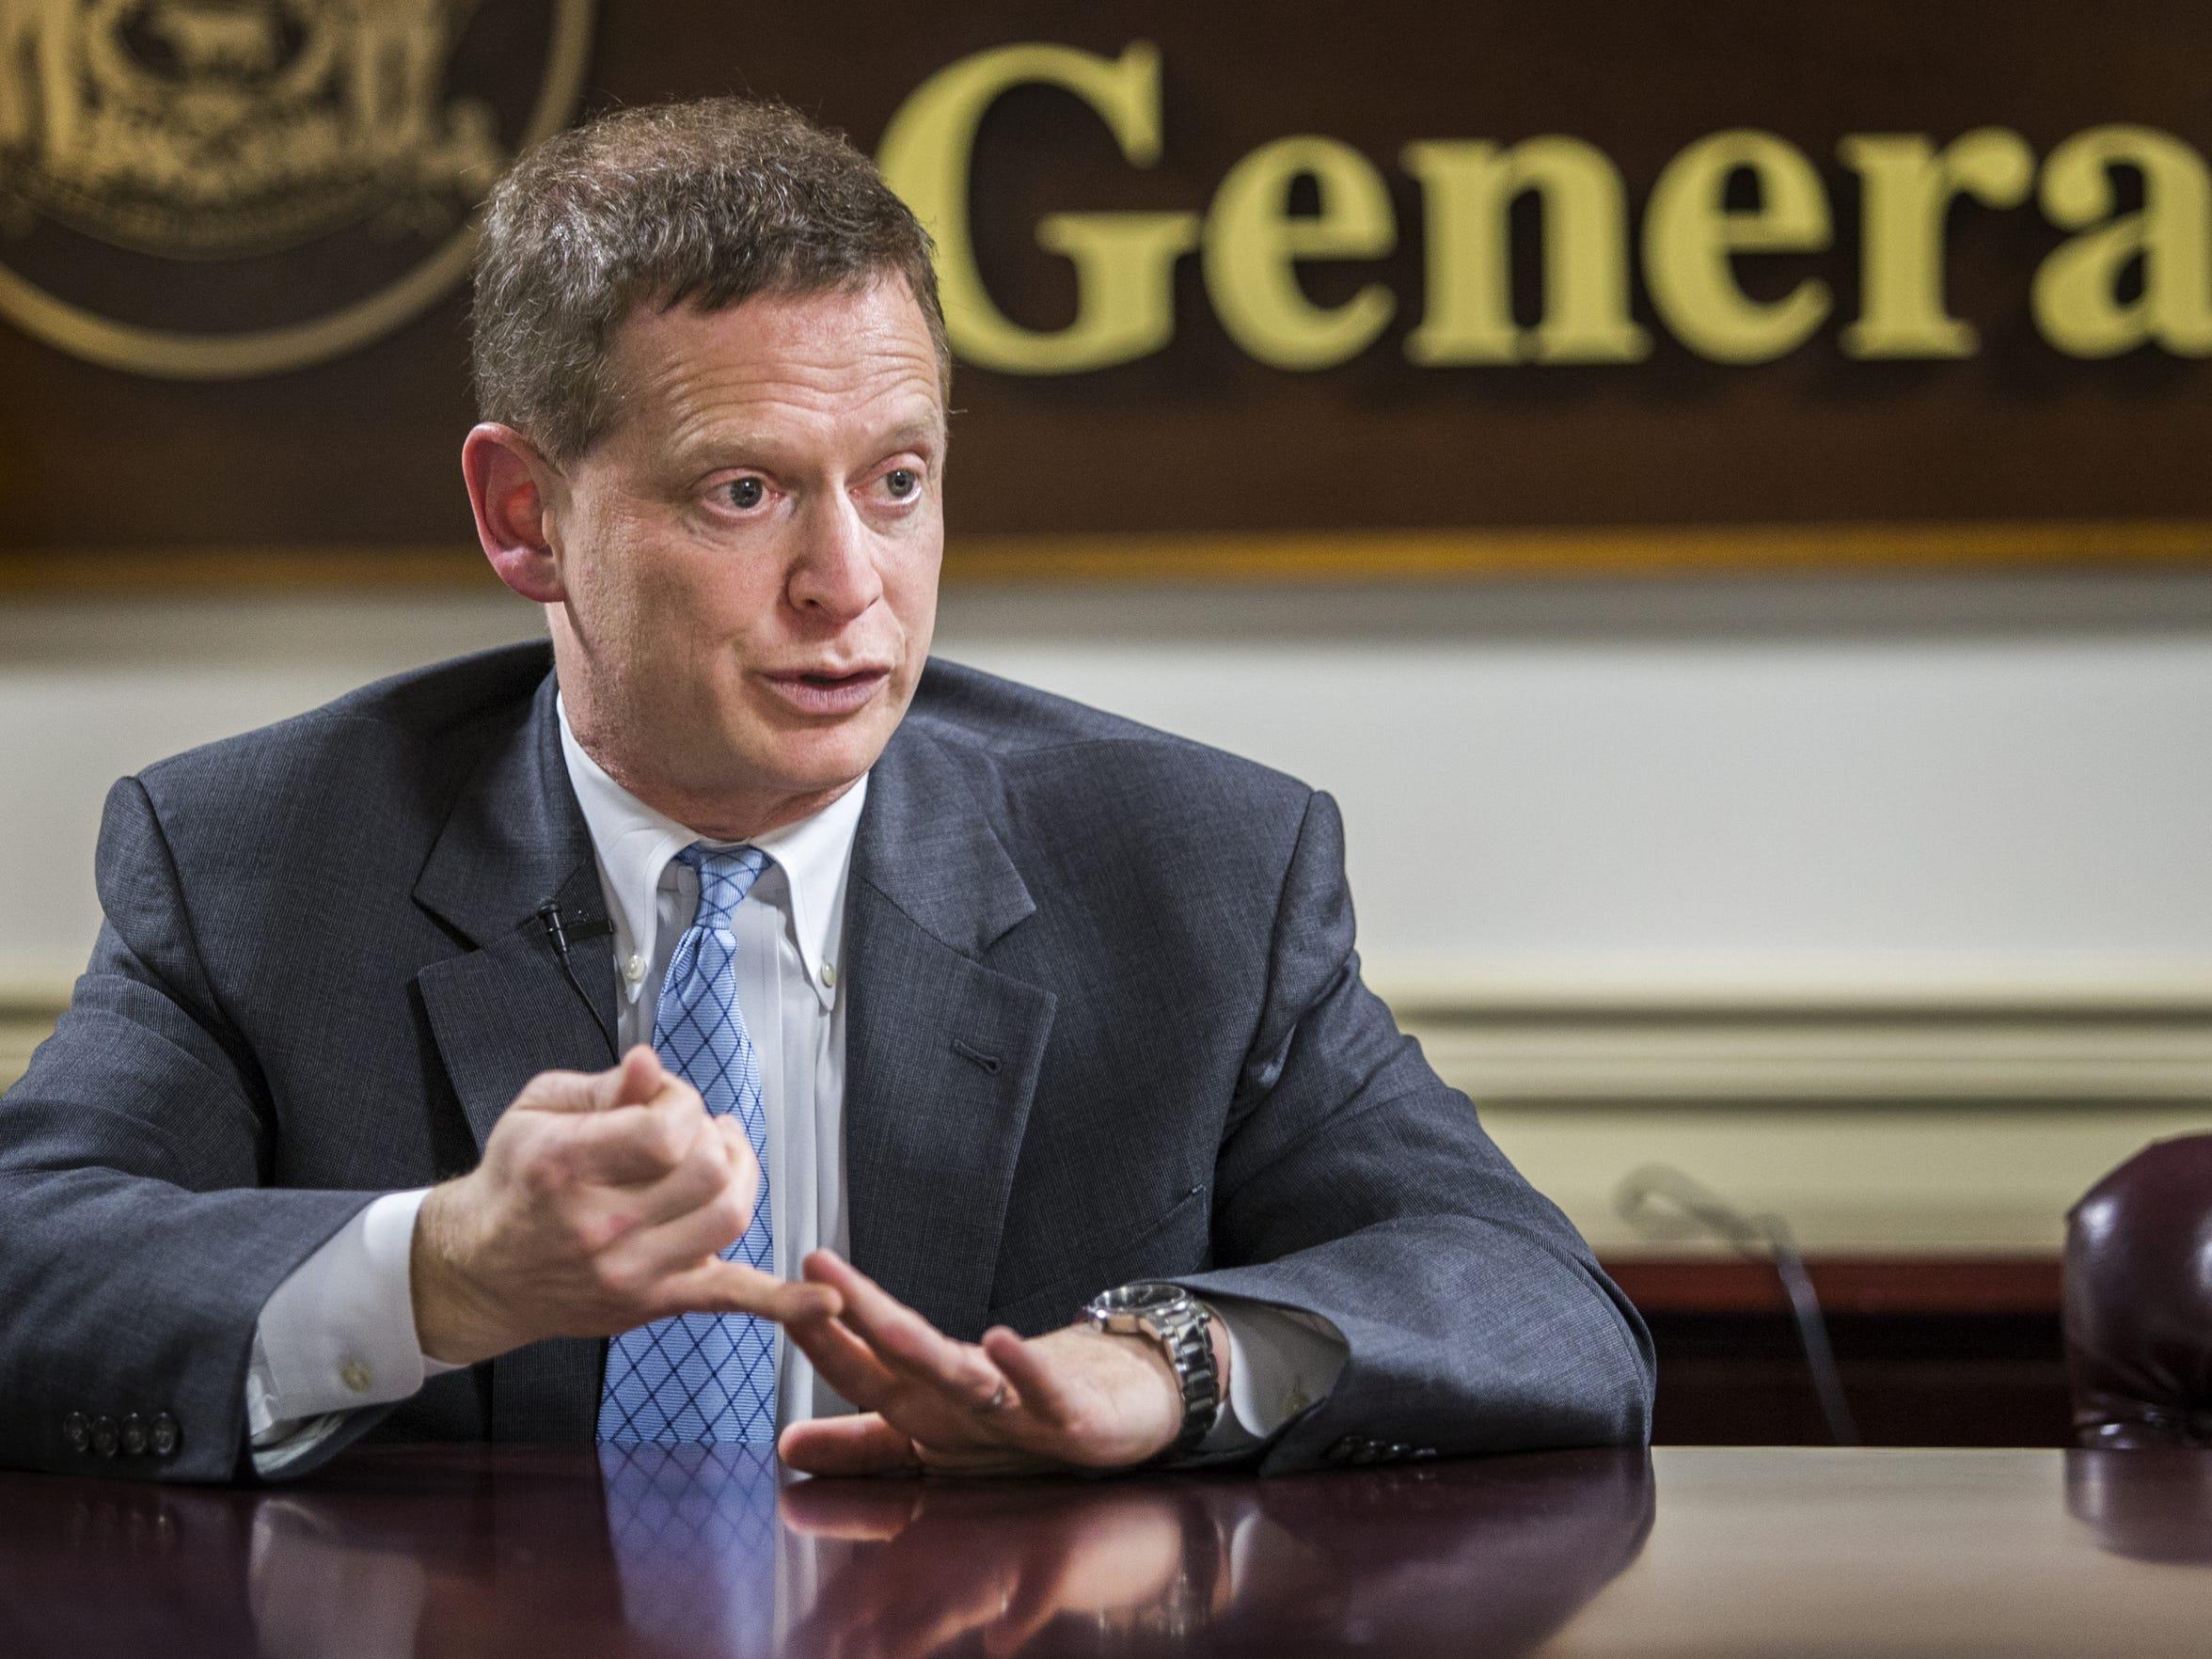 Attorney General Matt Denn discusses specifics regarding